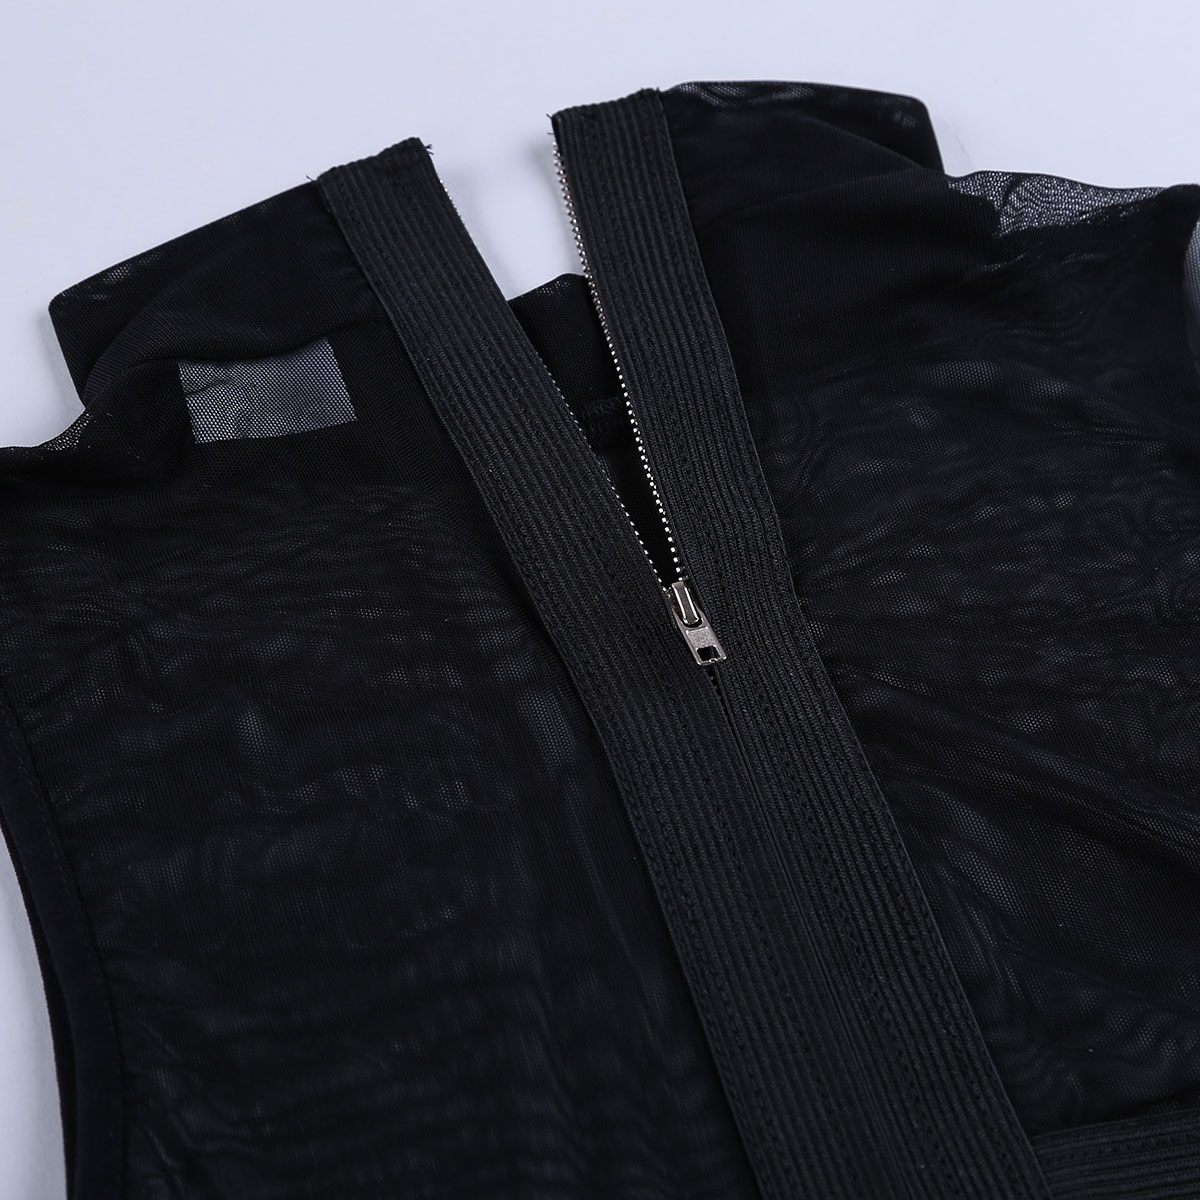 Womens Ladies Sexy Clubwear Tanks Tops Sleeveless Sheer Mesh See-through Zipper Back Elastic Strappy Criss Cross Tees Crop Top